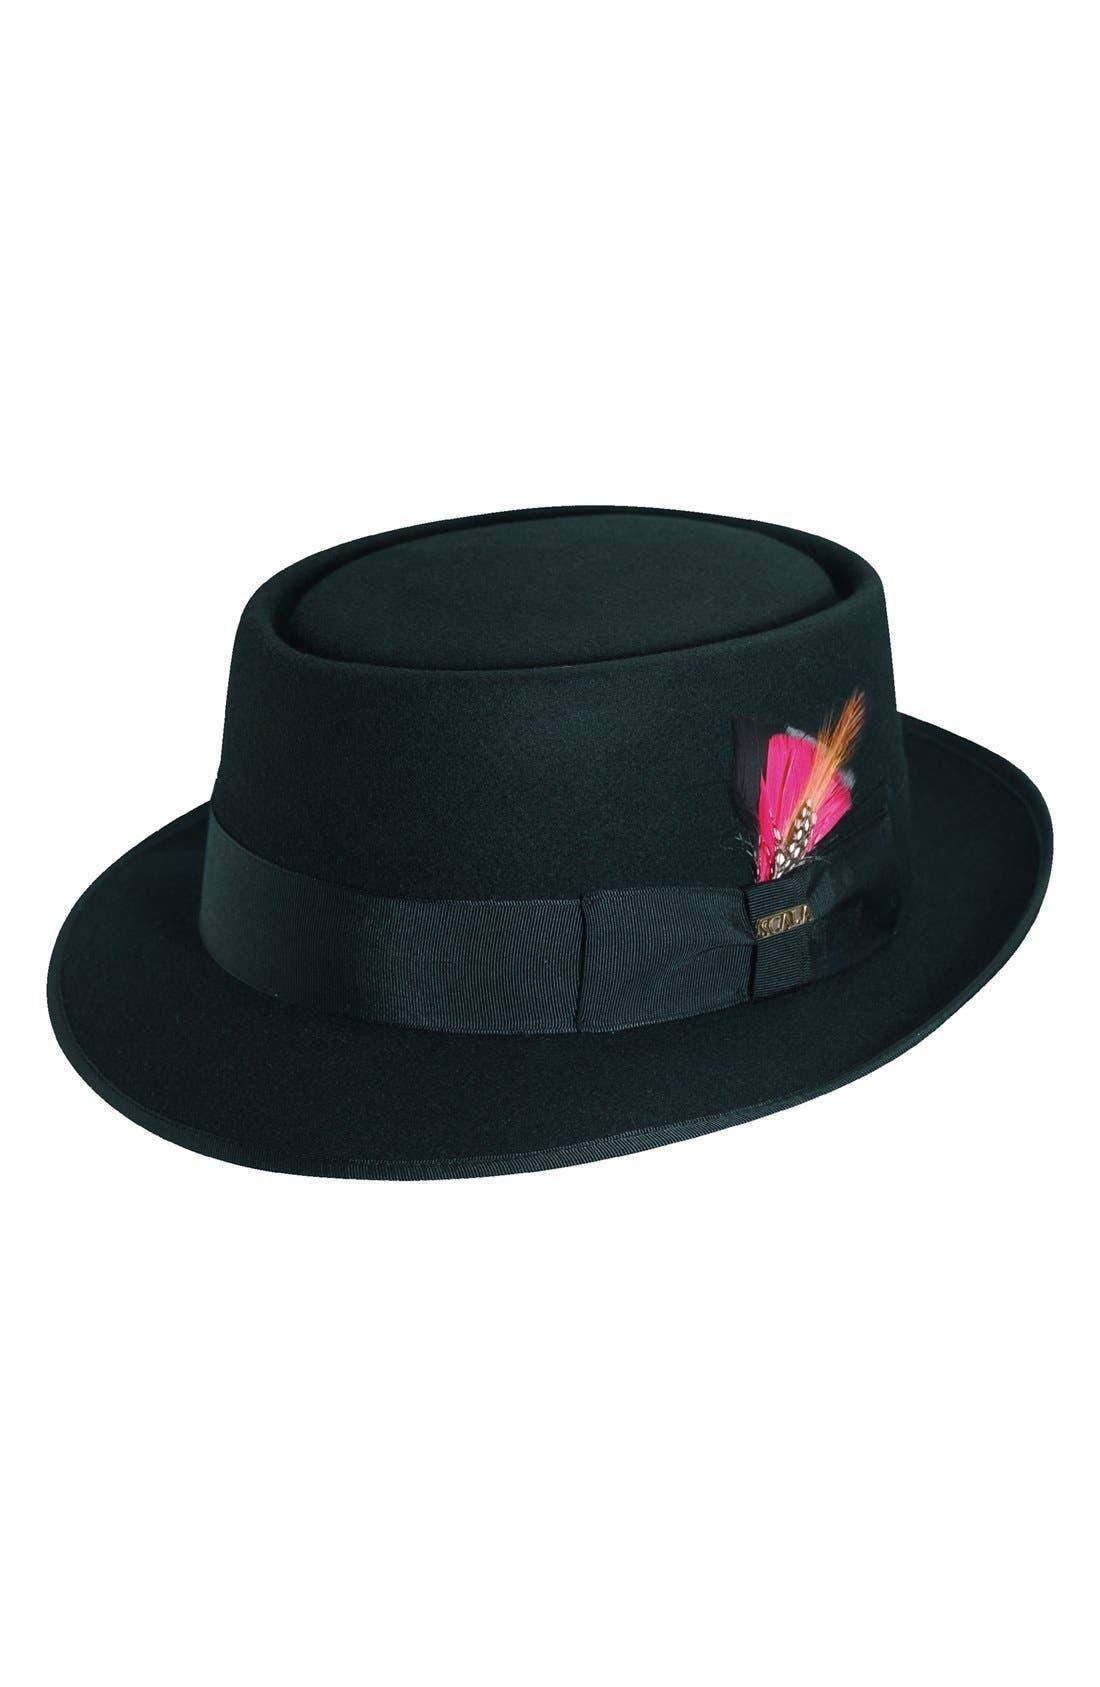 Alternate Image 1 Selected - Scala Wool Felt Porkpie Hat